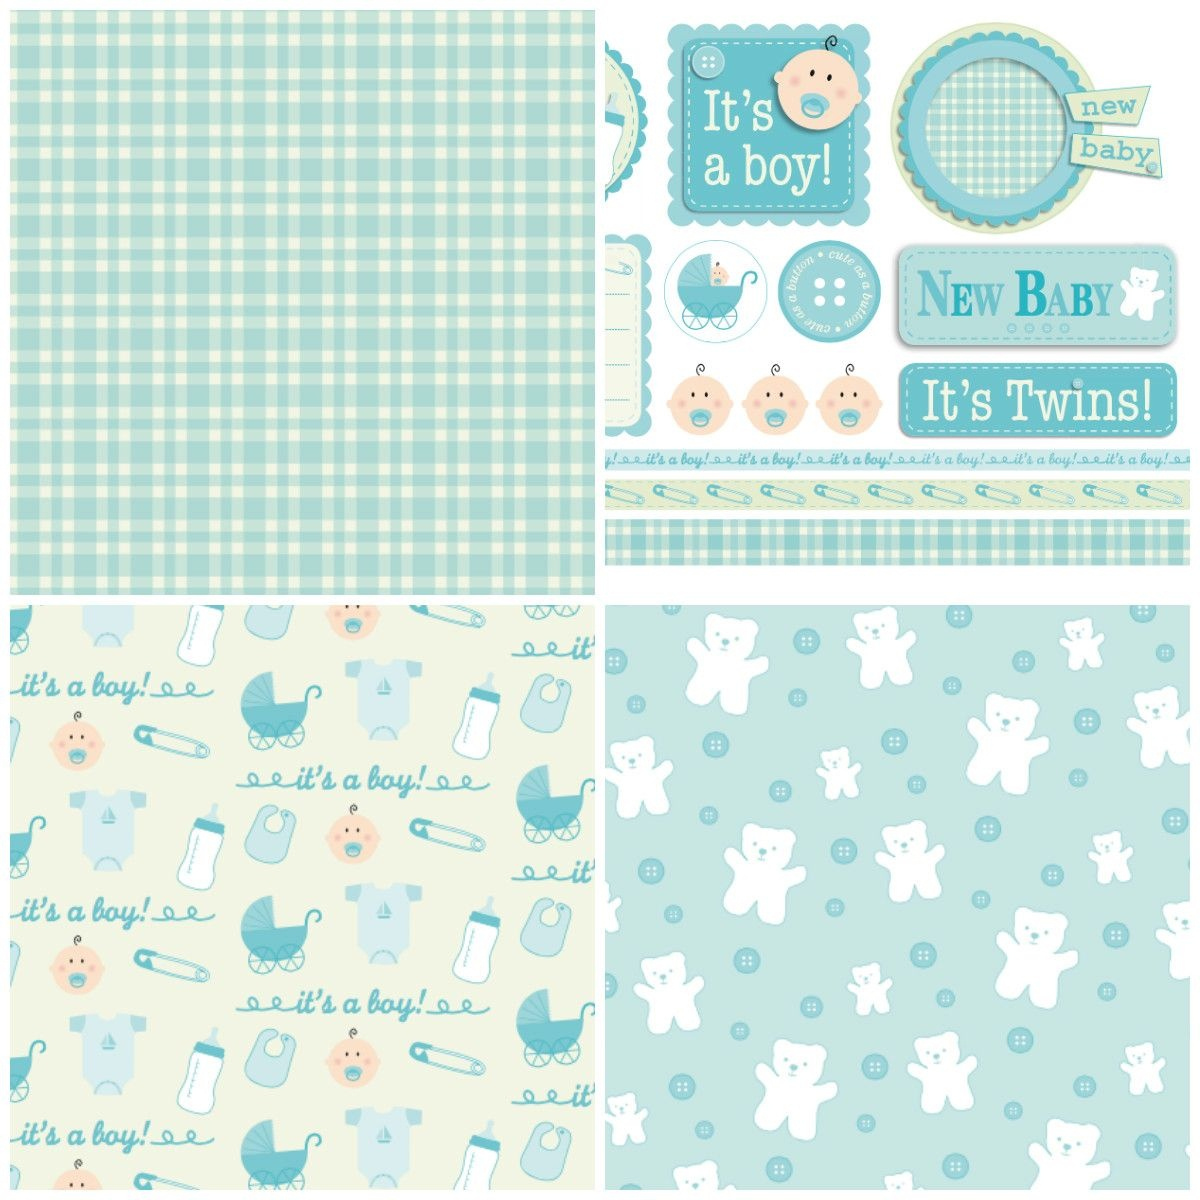 Handmade For Babies – Free Papers   Printable Papers   Digital Paper - Free Printable Scrapbook Stuff